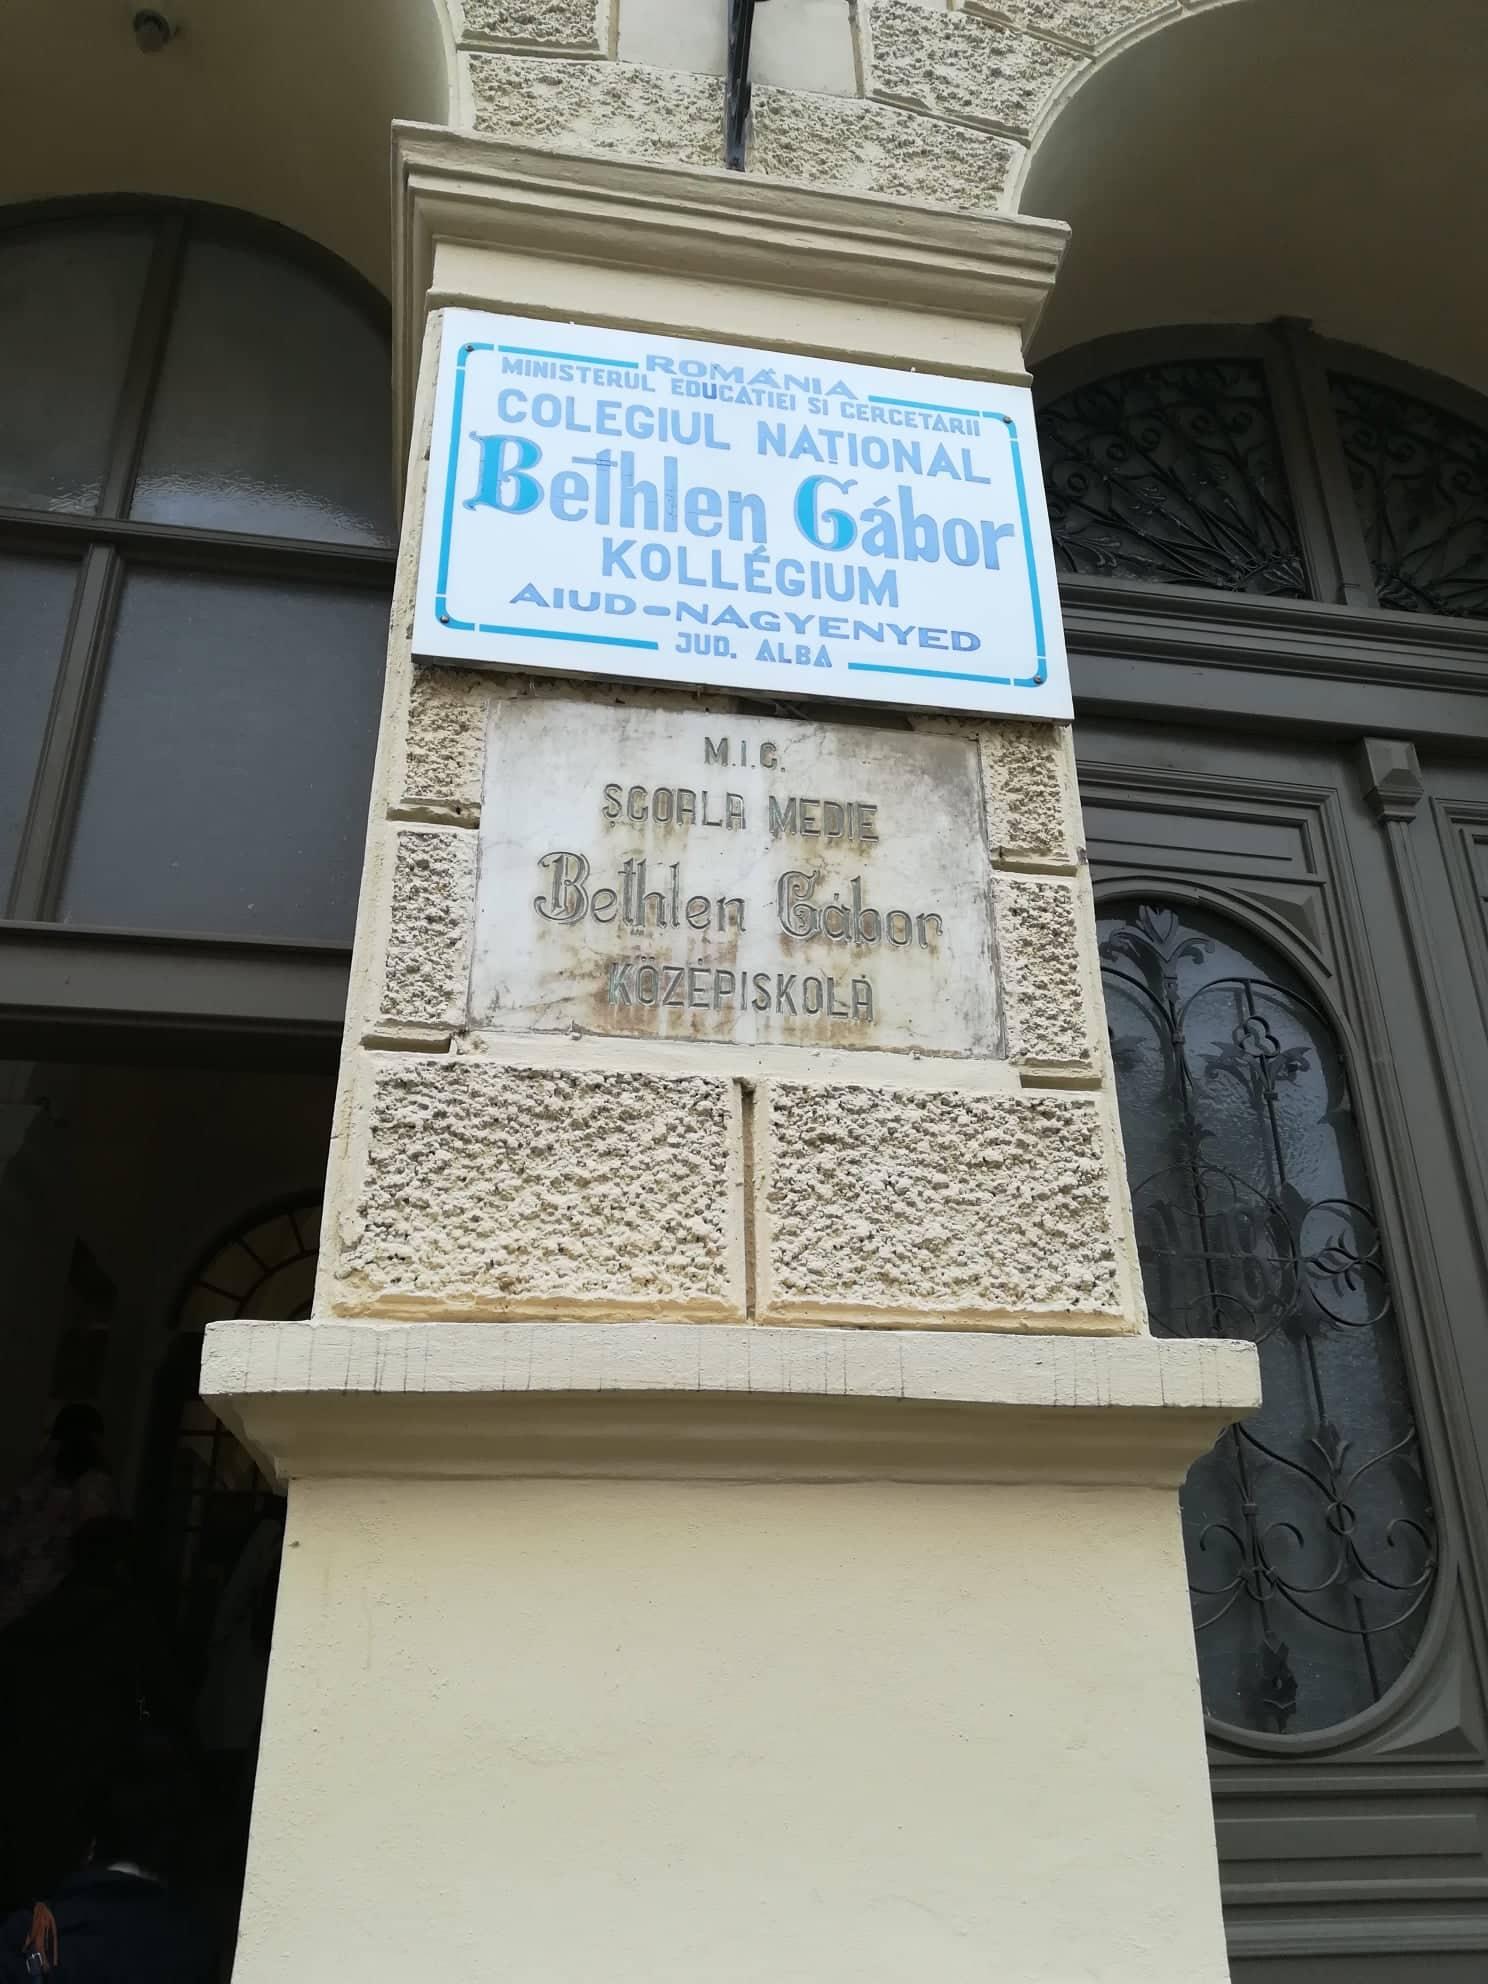 Nagyenyed, Bethlen Gábor Kollégium